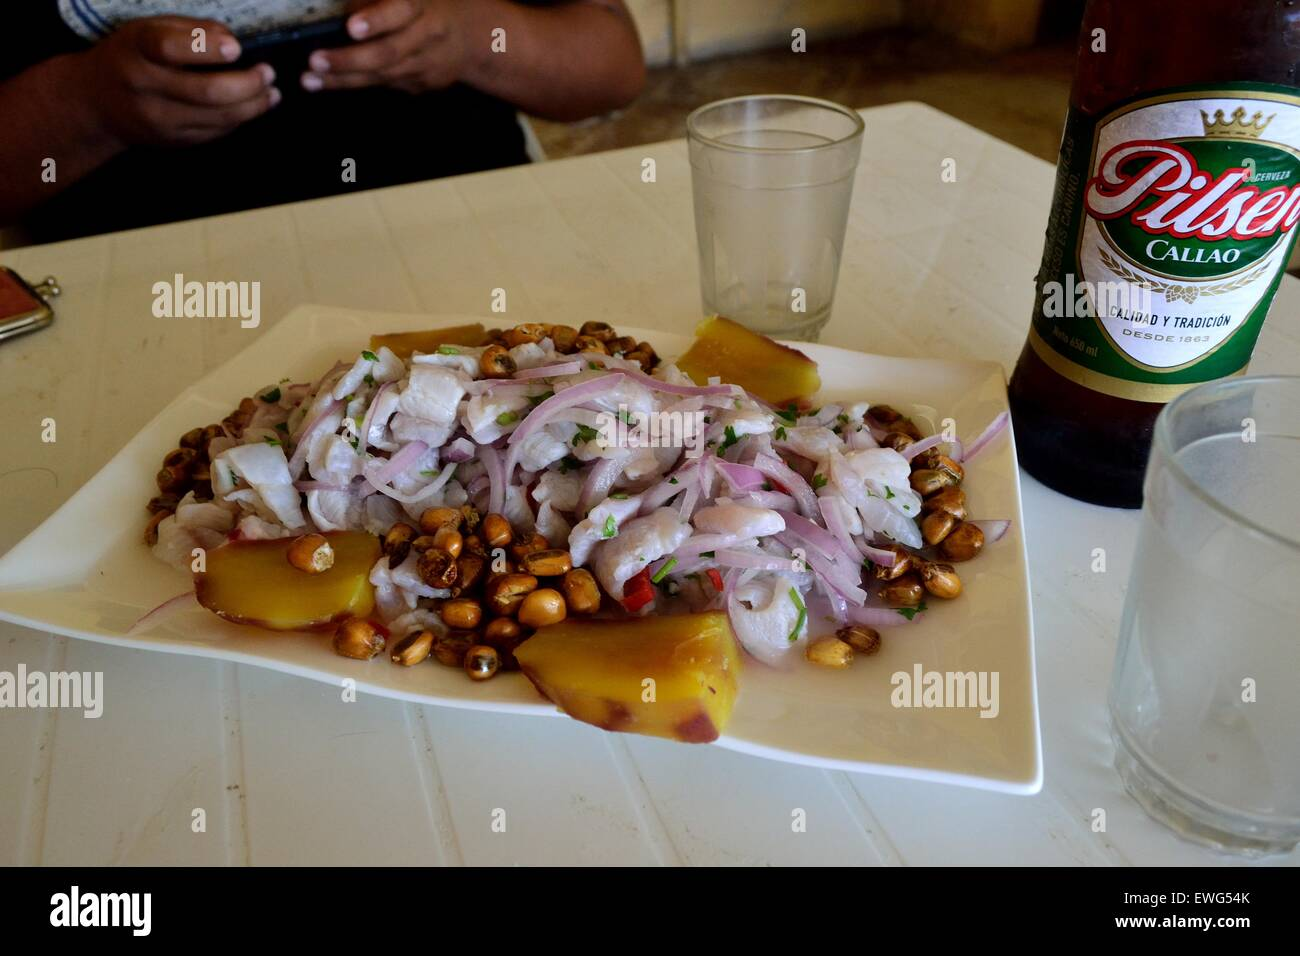 Ceviche Restaurant In Puerto Pizarro Department Of Tumbes Peru Stock Photo Alamy